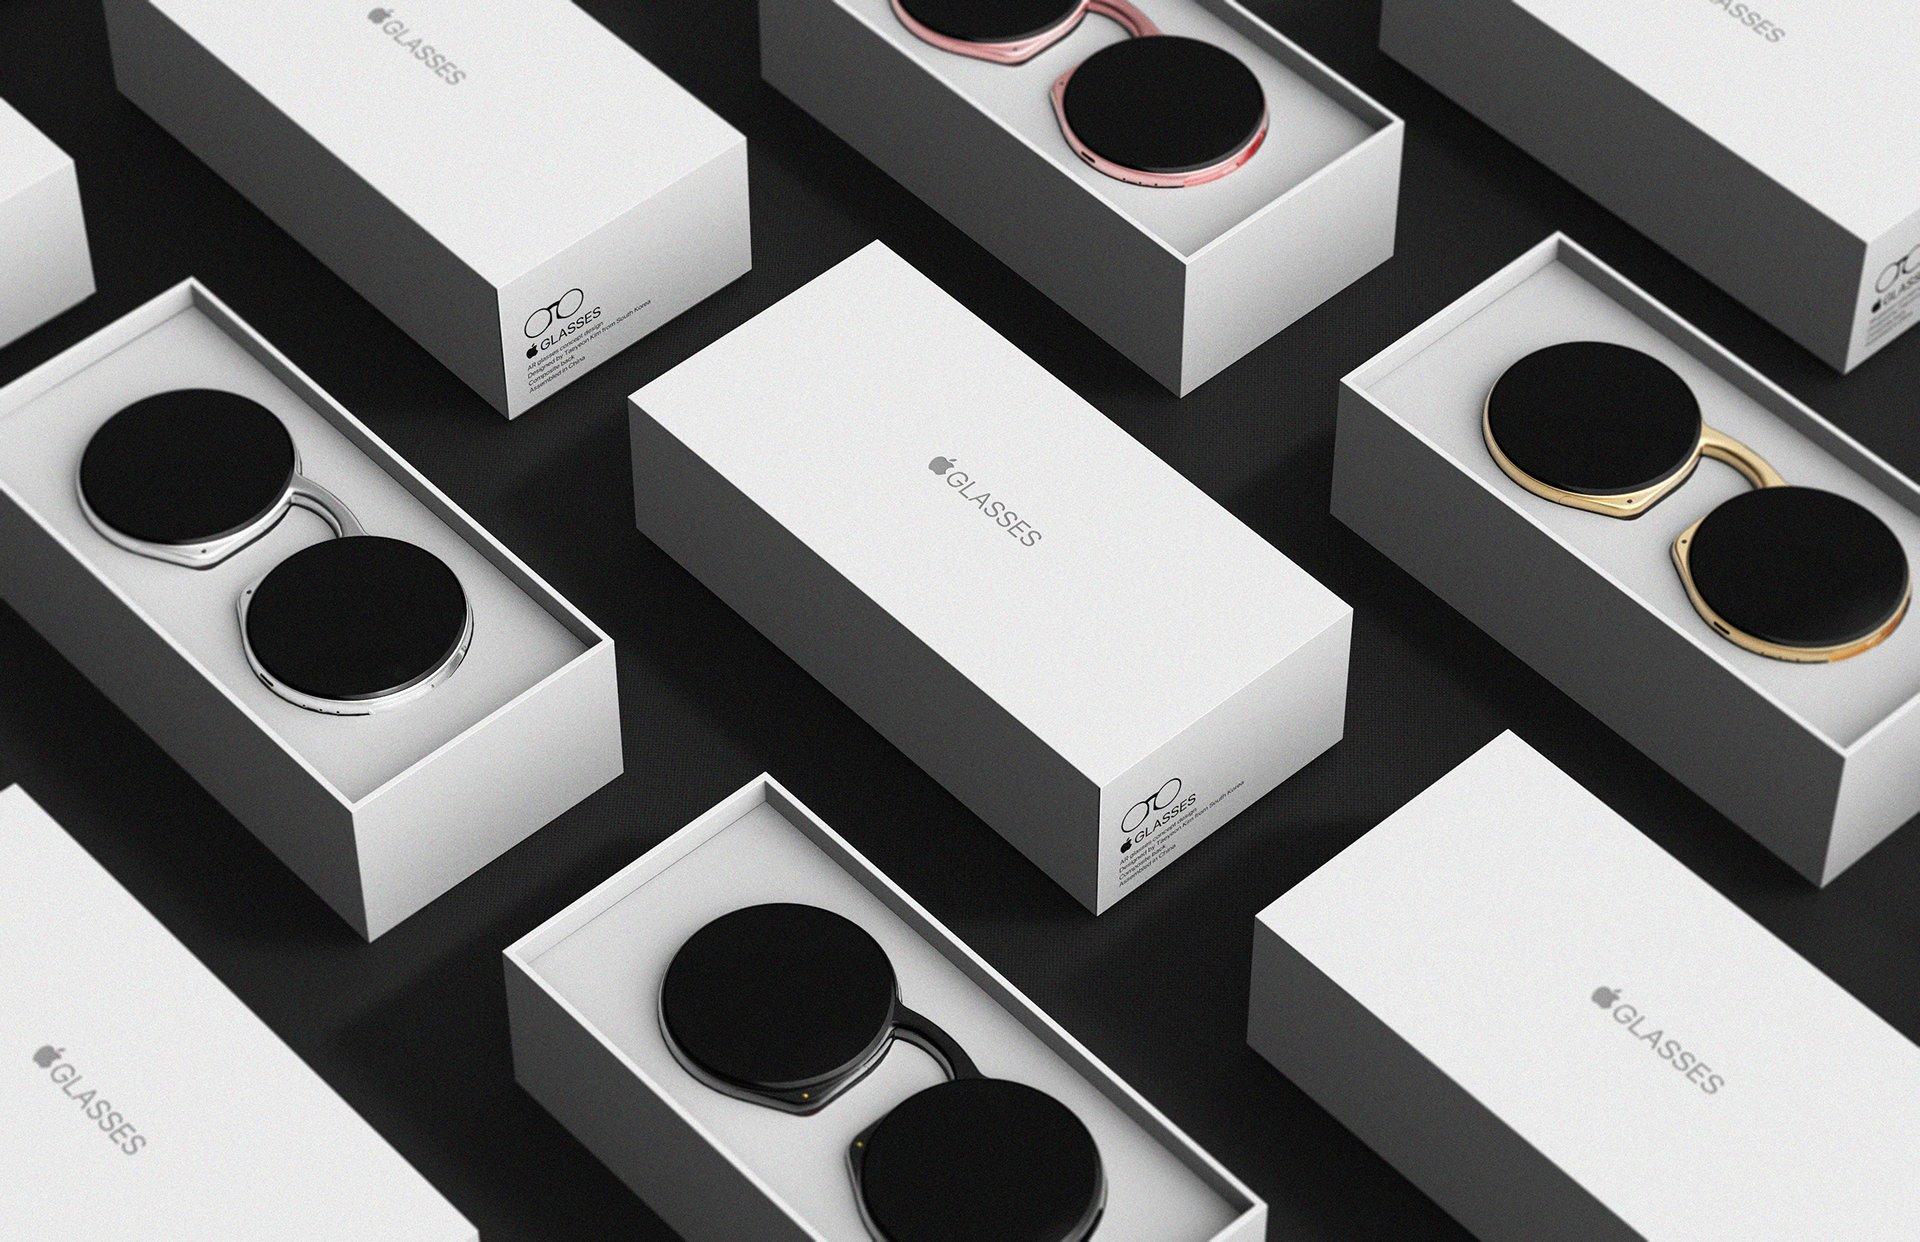 Apple's AR Headset might launch really soon